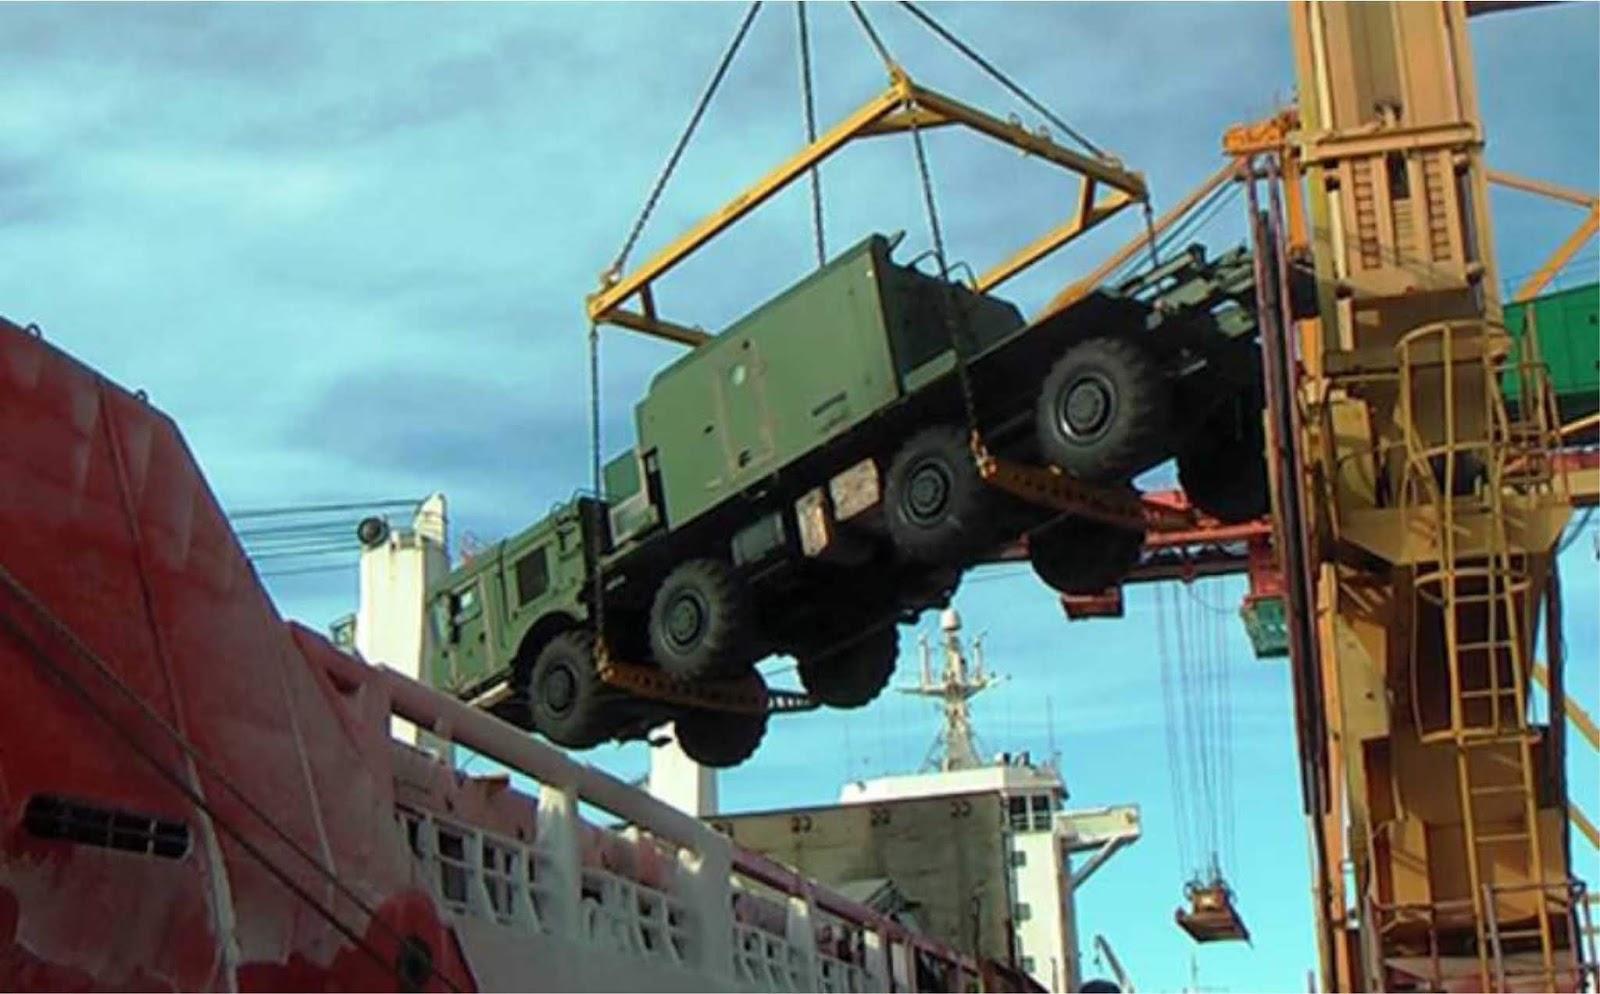 Komplek rudal pesisir Bal baru tiba di Armada Pasifik Rusia